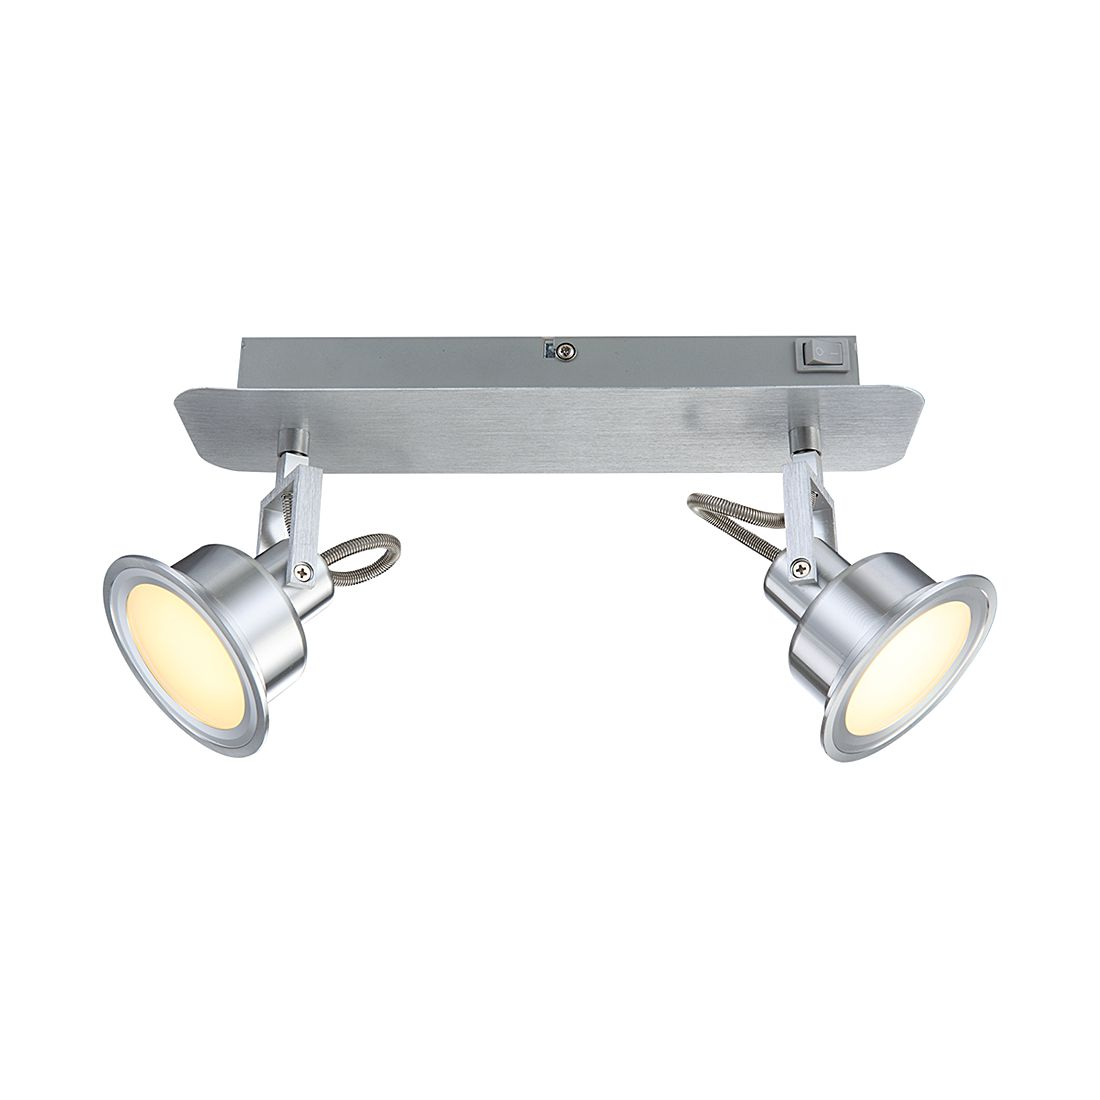 Deckenstrahler – Aluminium/Glas – 2-flammig, Globo Lighting bestellen